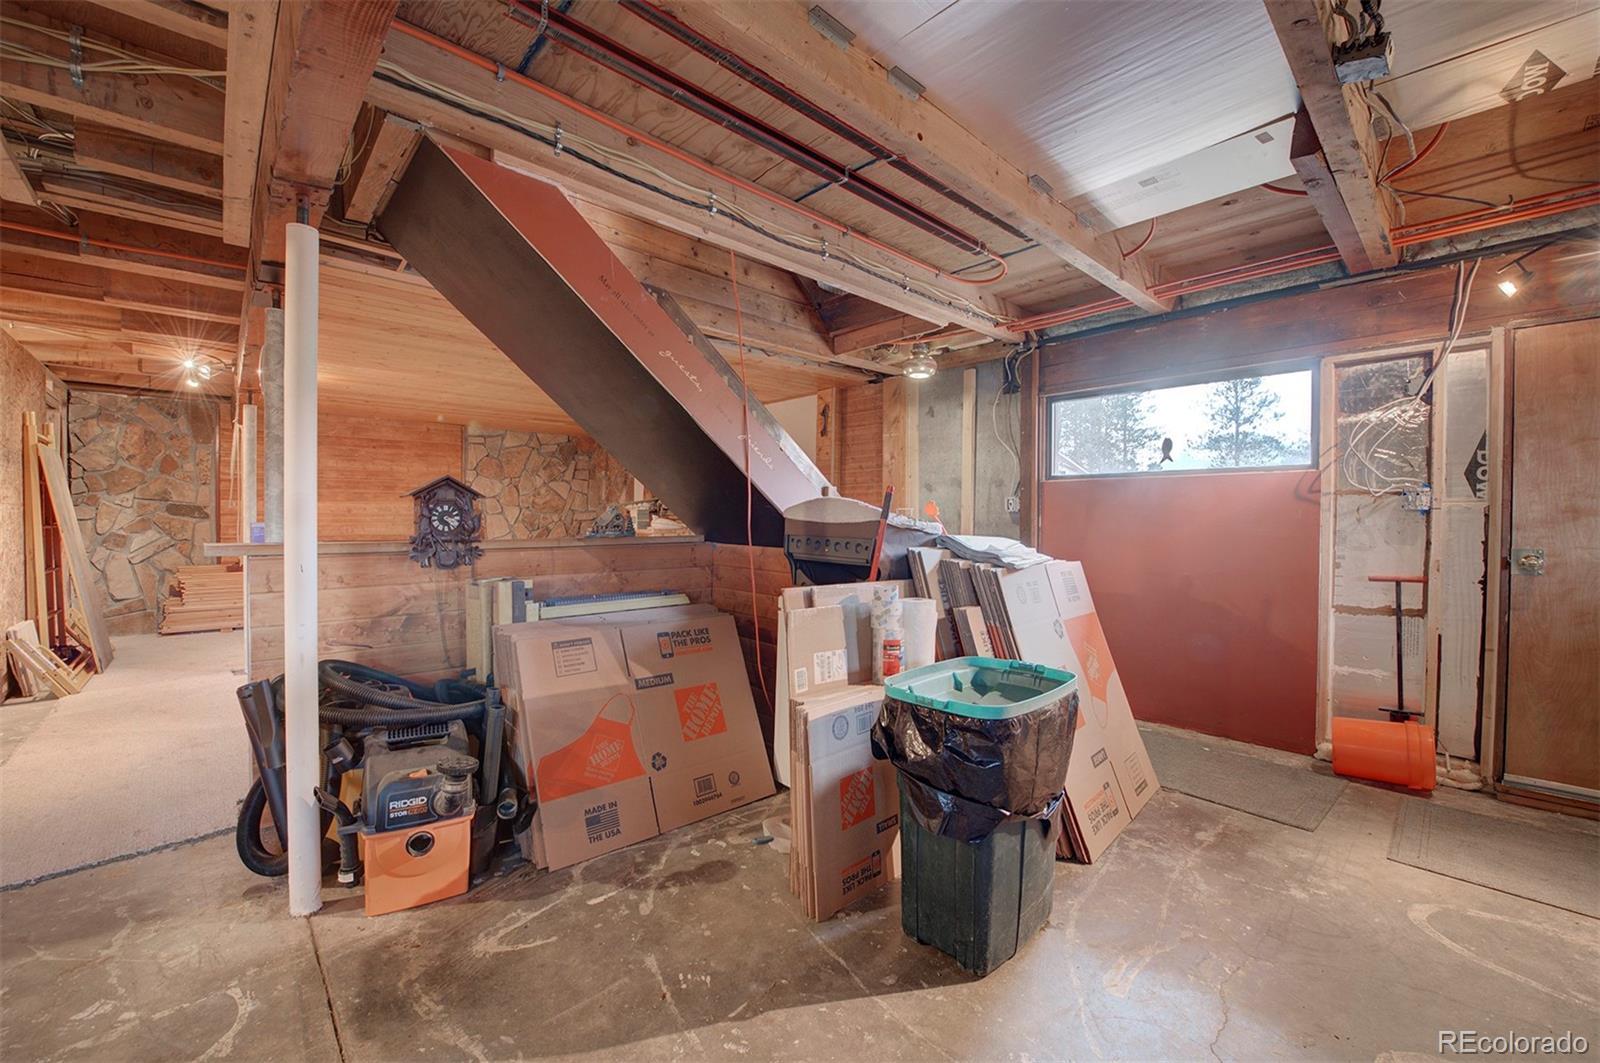 MLS# 6922377 - 29 - 12123 Geronimo Trail, Conifer, CO 80433